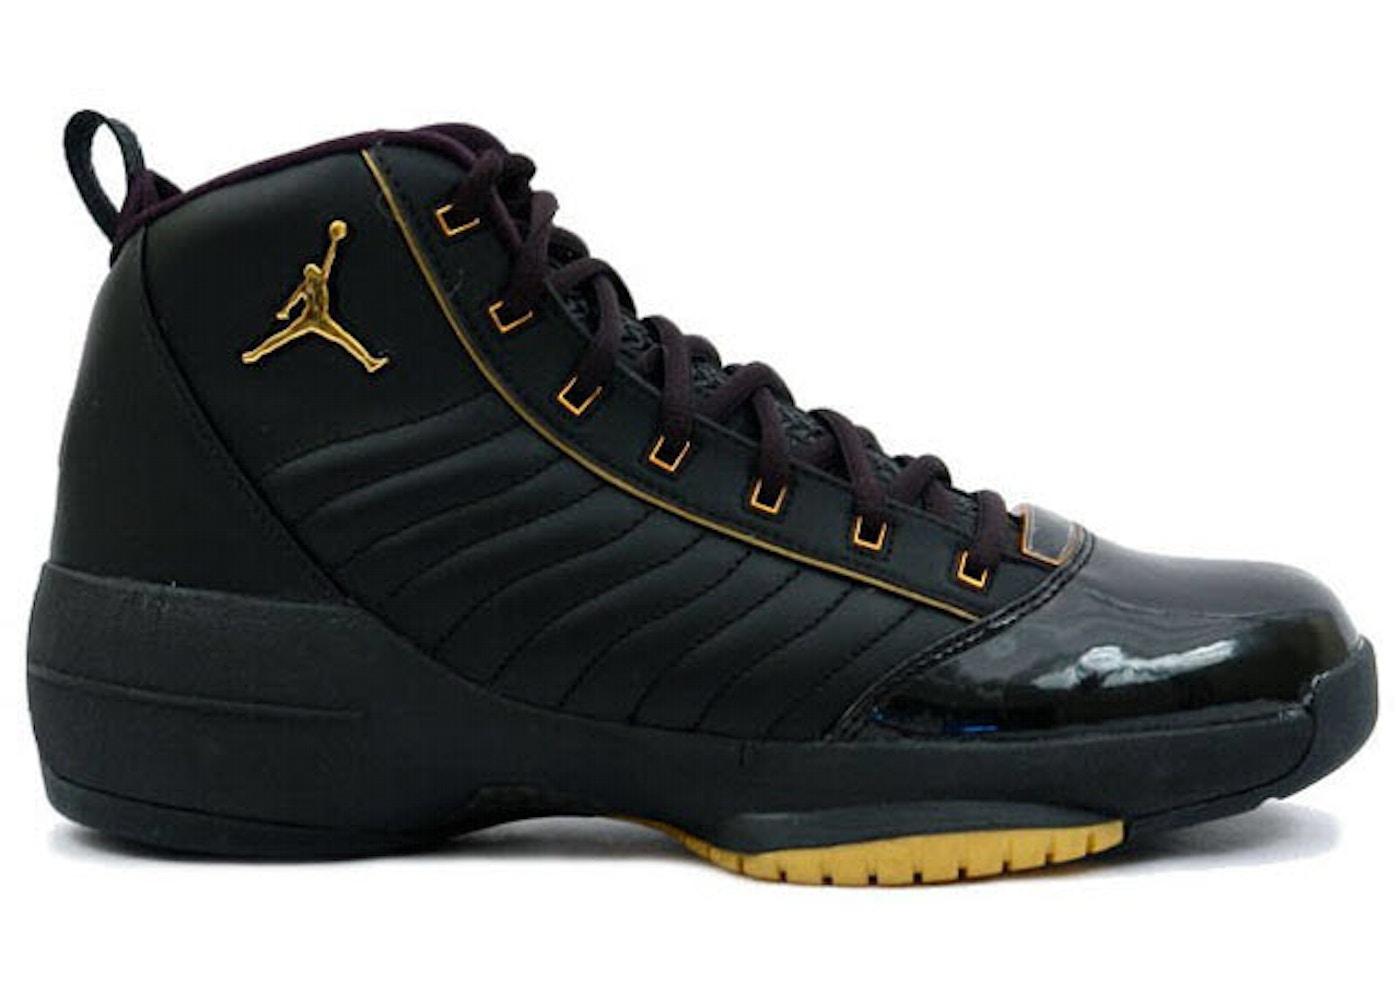 6198b034b2adbc Sell. or Ask. Size  10. View All Bids. Jordan 19 OG SE Black Metallic Gold